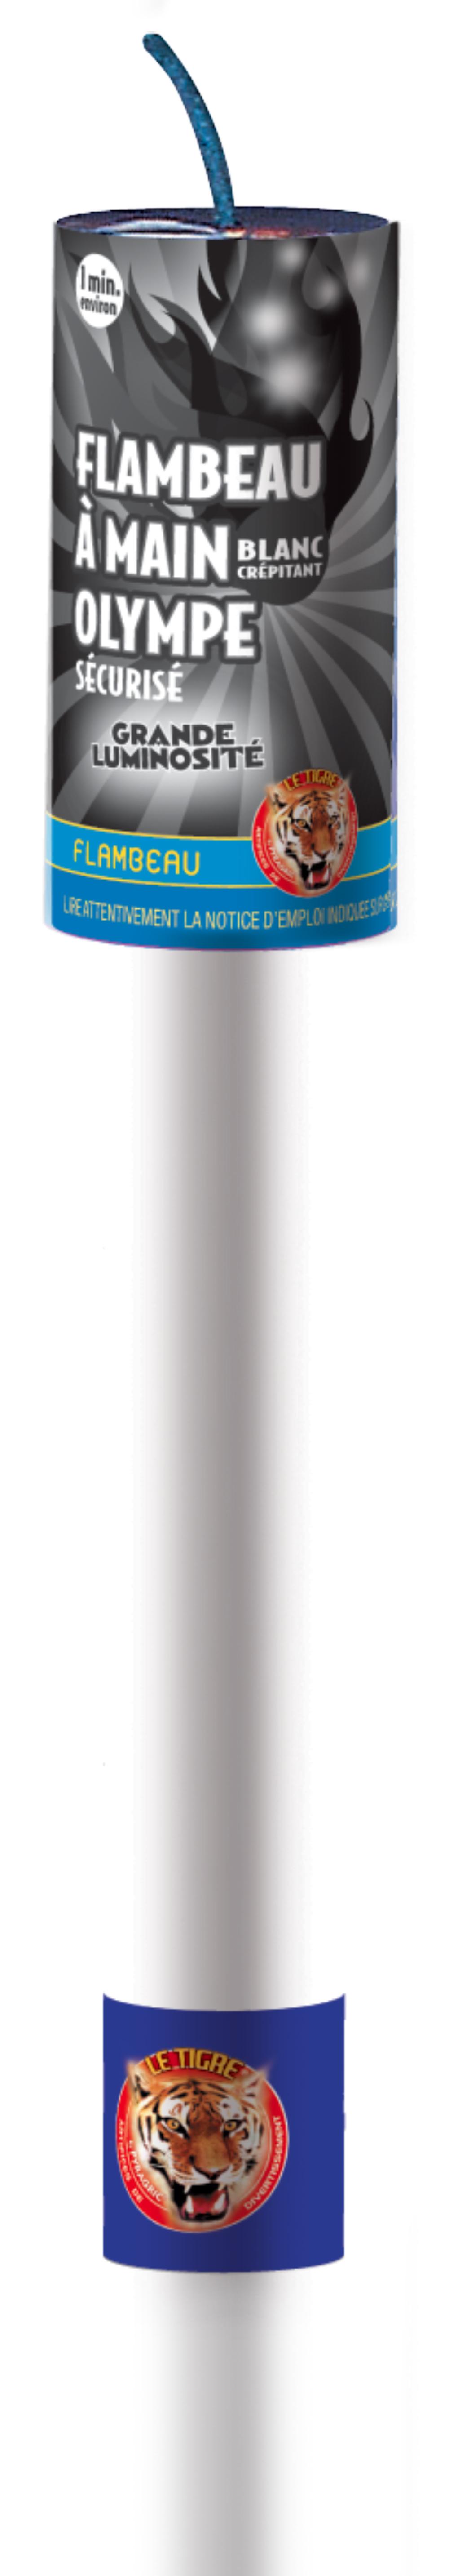 P050517_FLAMBEAU-OLYMPE-blanc-3d